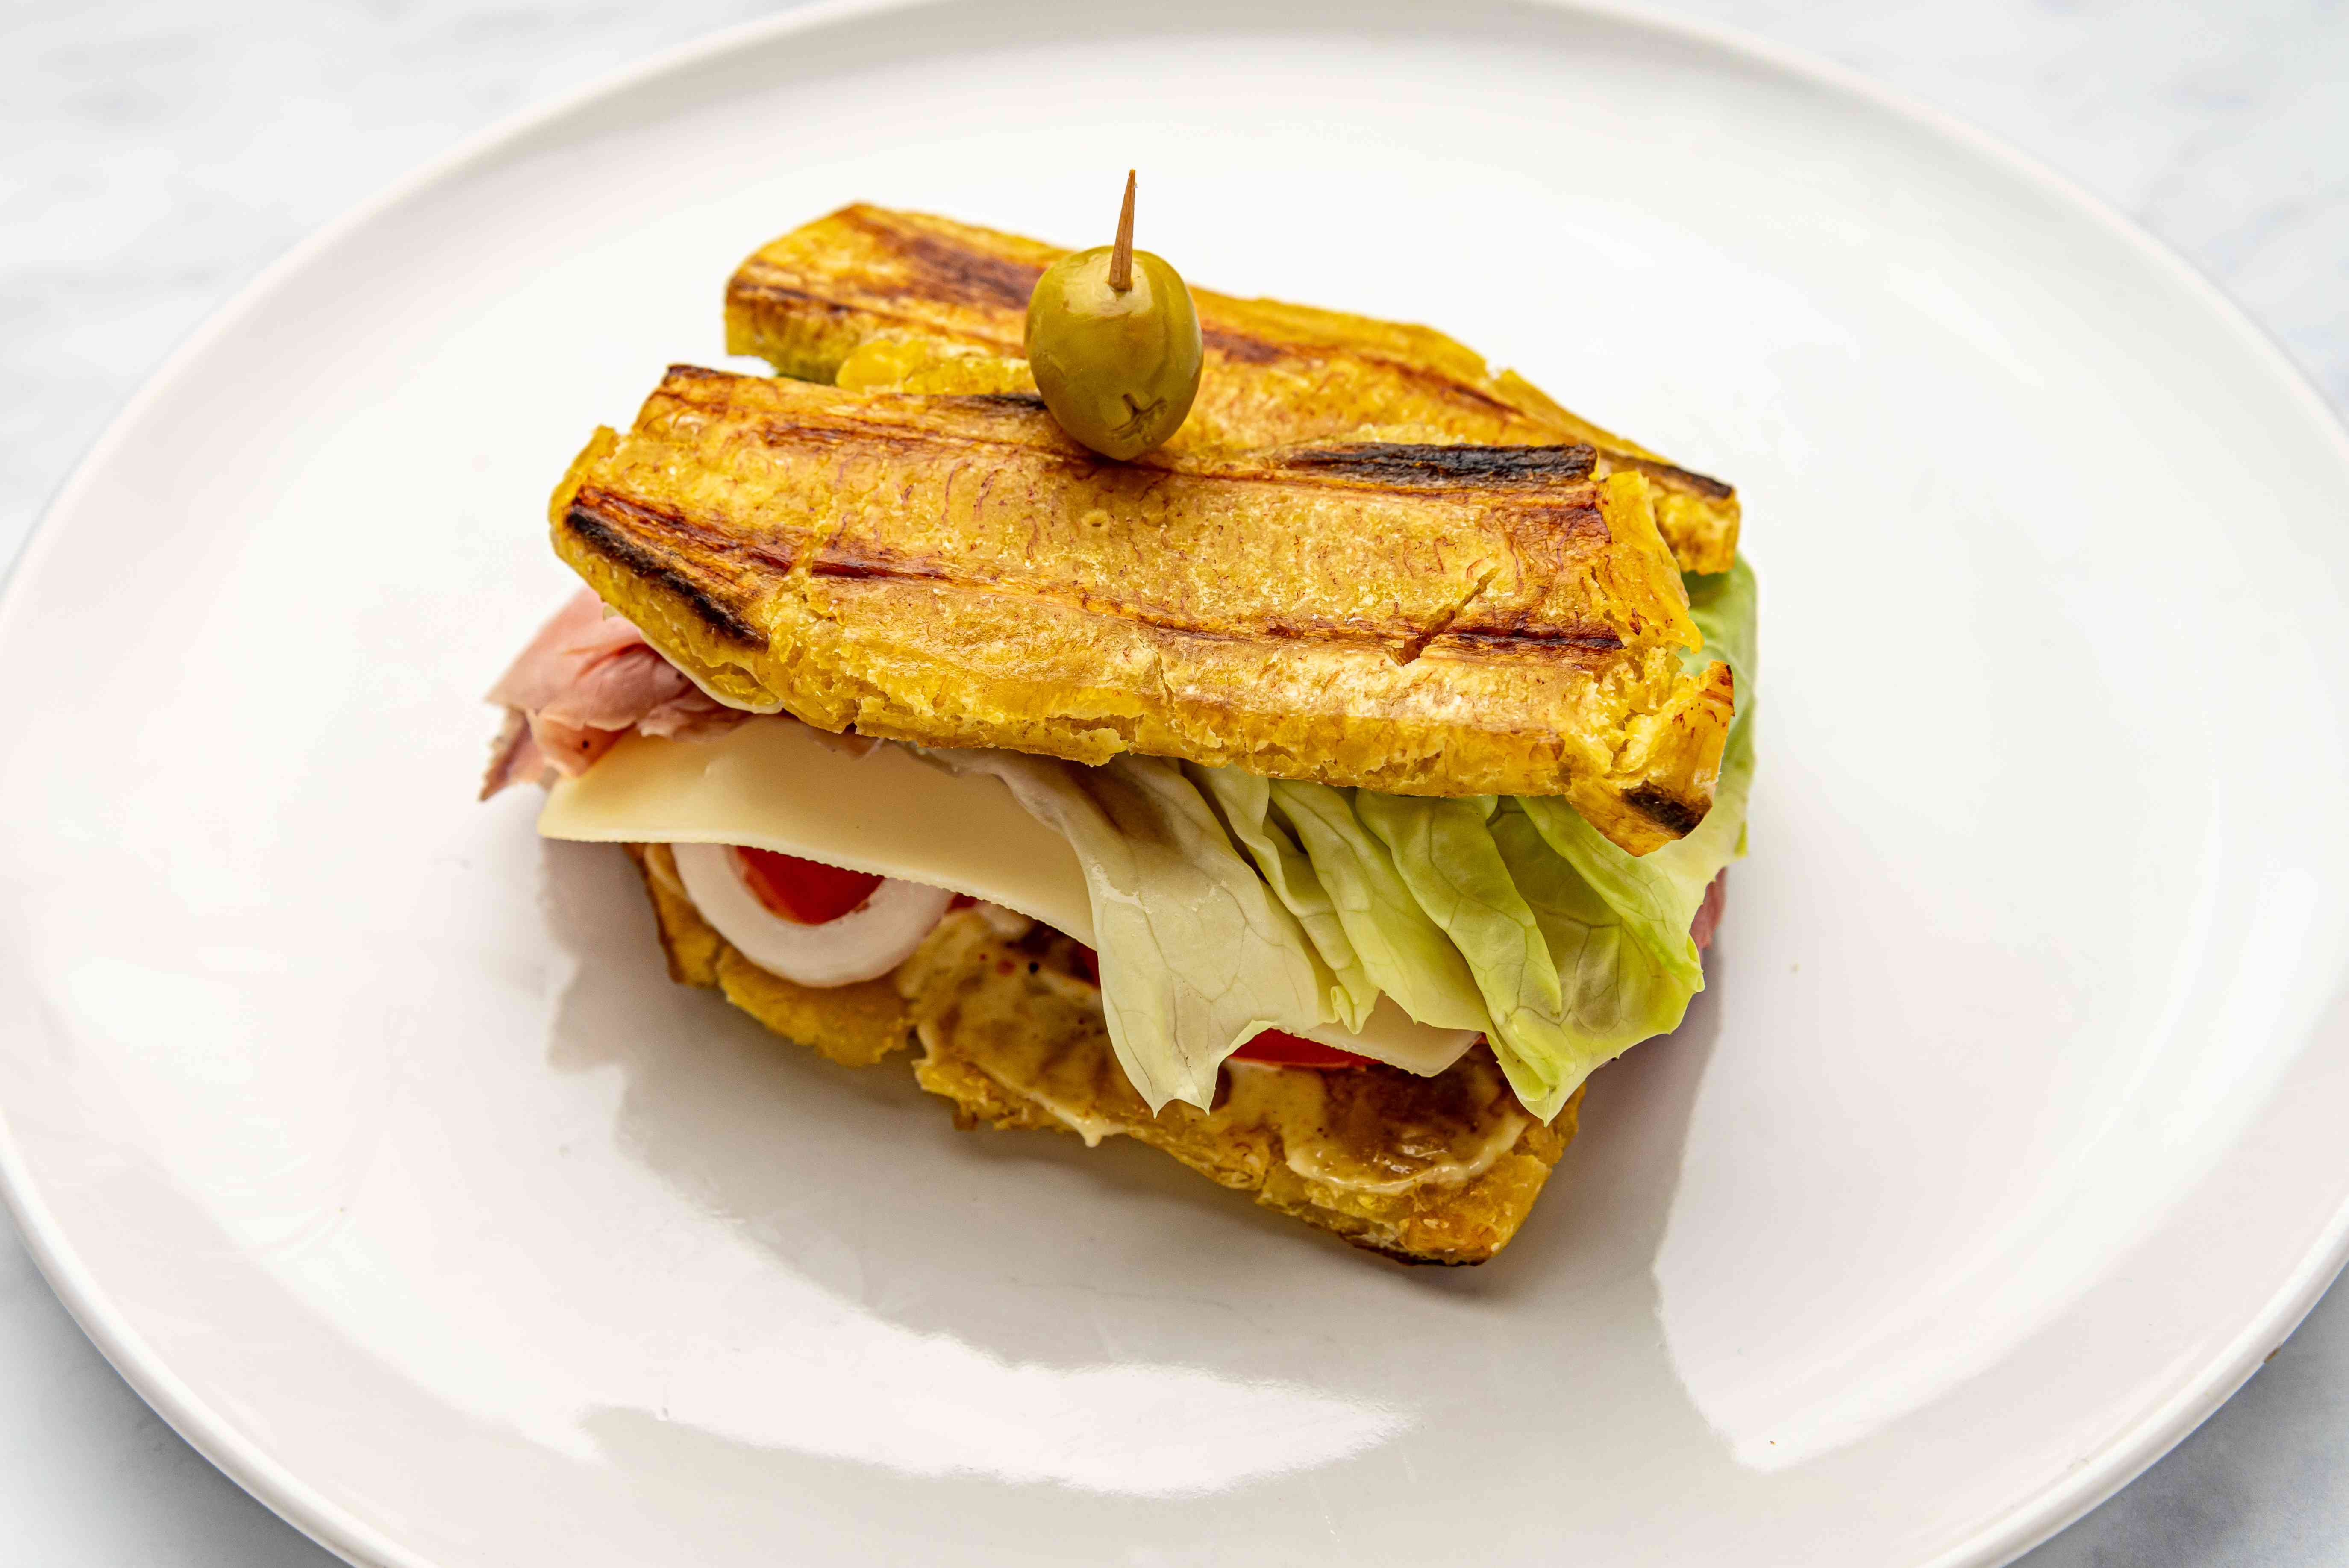 Smashed Plantain Sandwich (Jibarito) on a plate